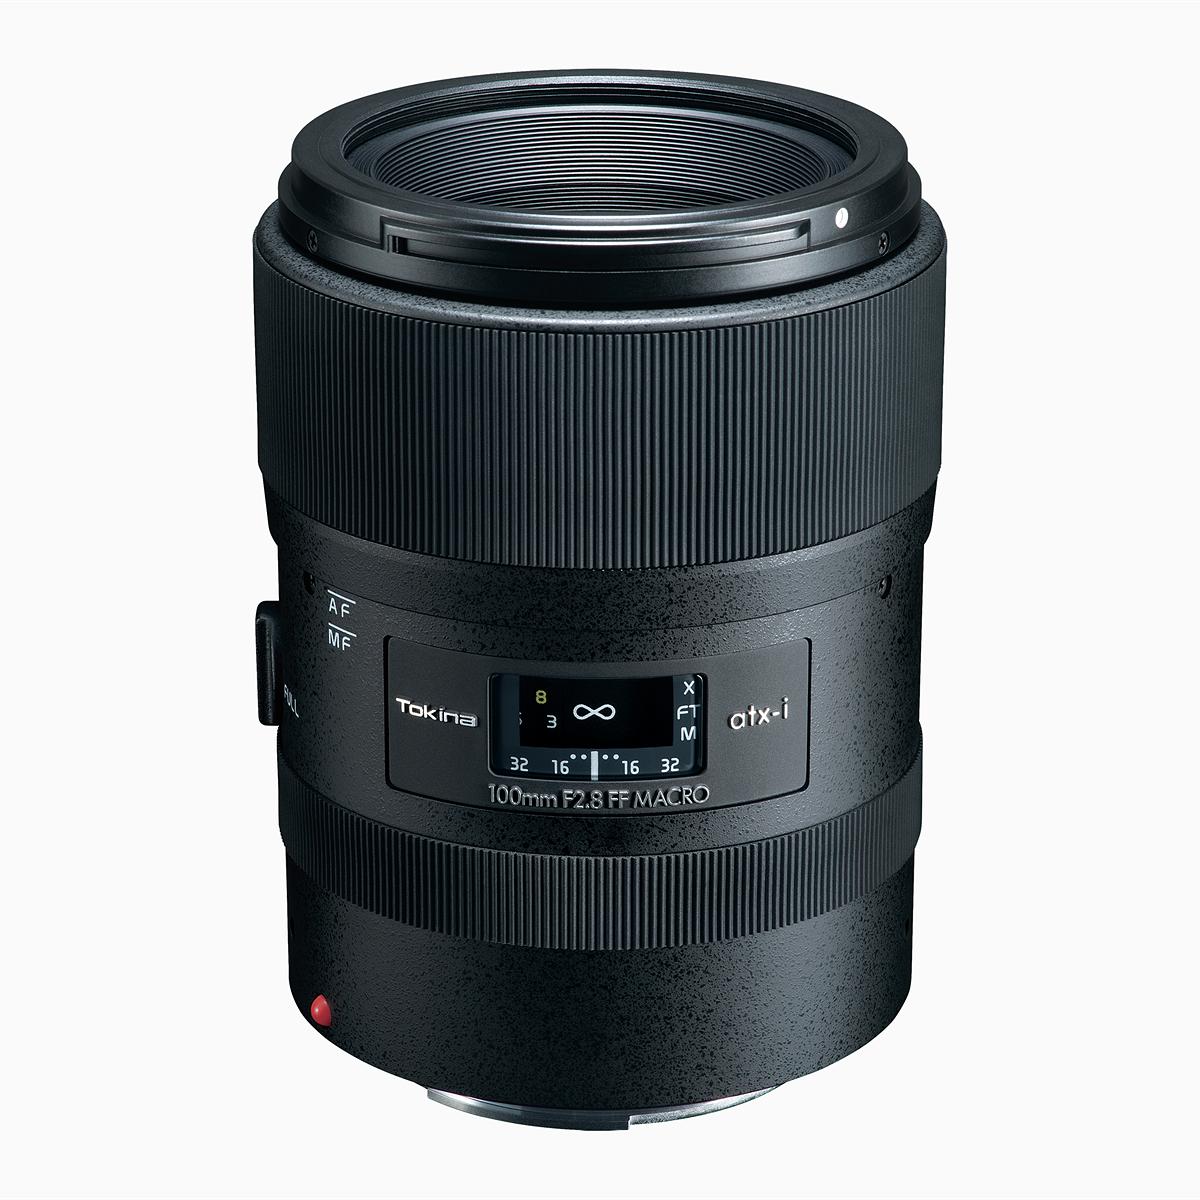 Replacement Tokina Lens Hood for 100mm f/2.8 Macro Lens BH551 ...